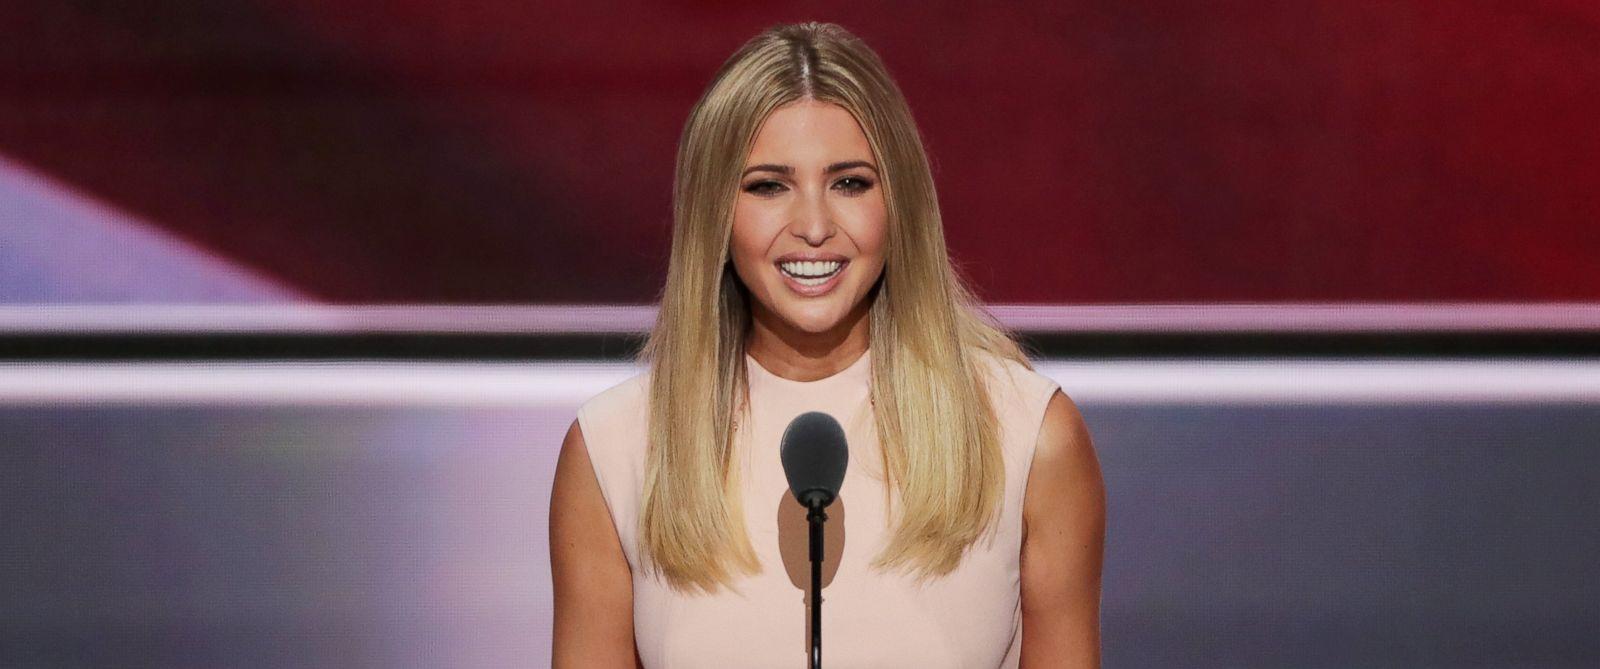 Ivanka Trump Calls Sexual Harassment 'Inexcusable' - ABC News